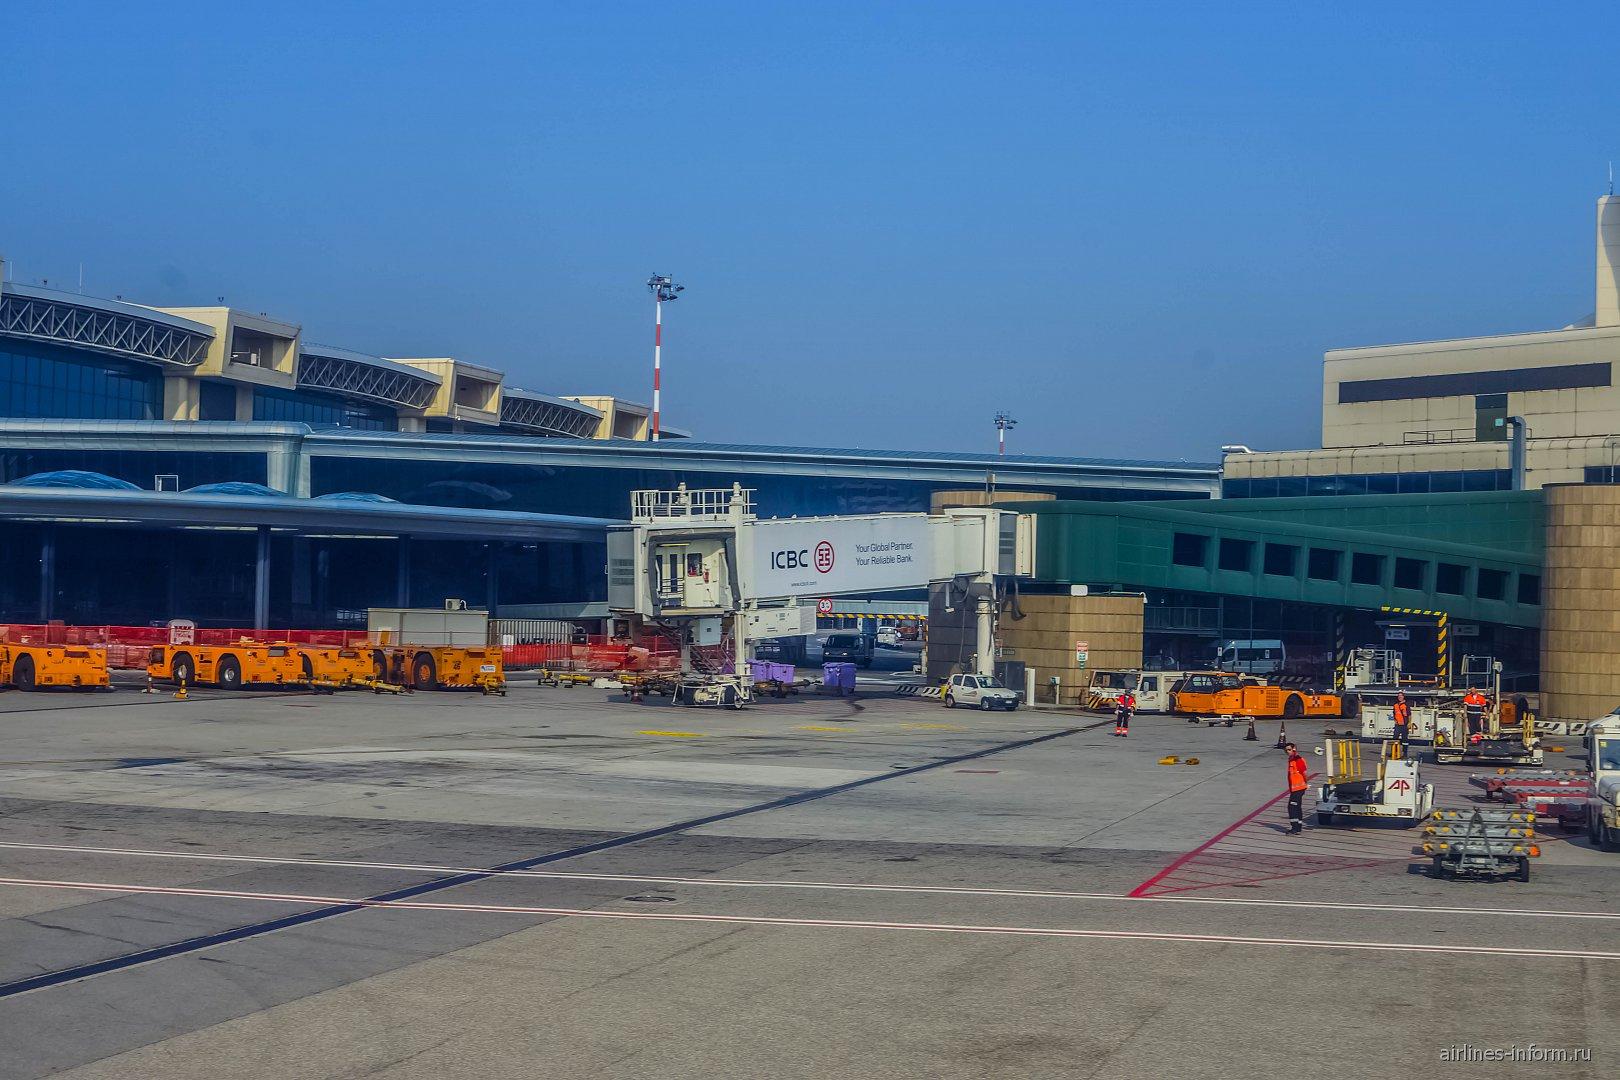 Гейт B1 терминала 1 аэропорта Милан Мальпенса